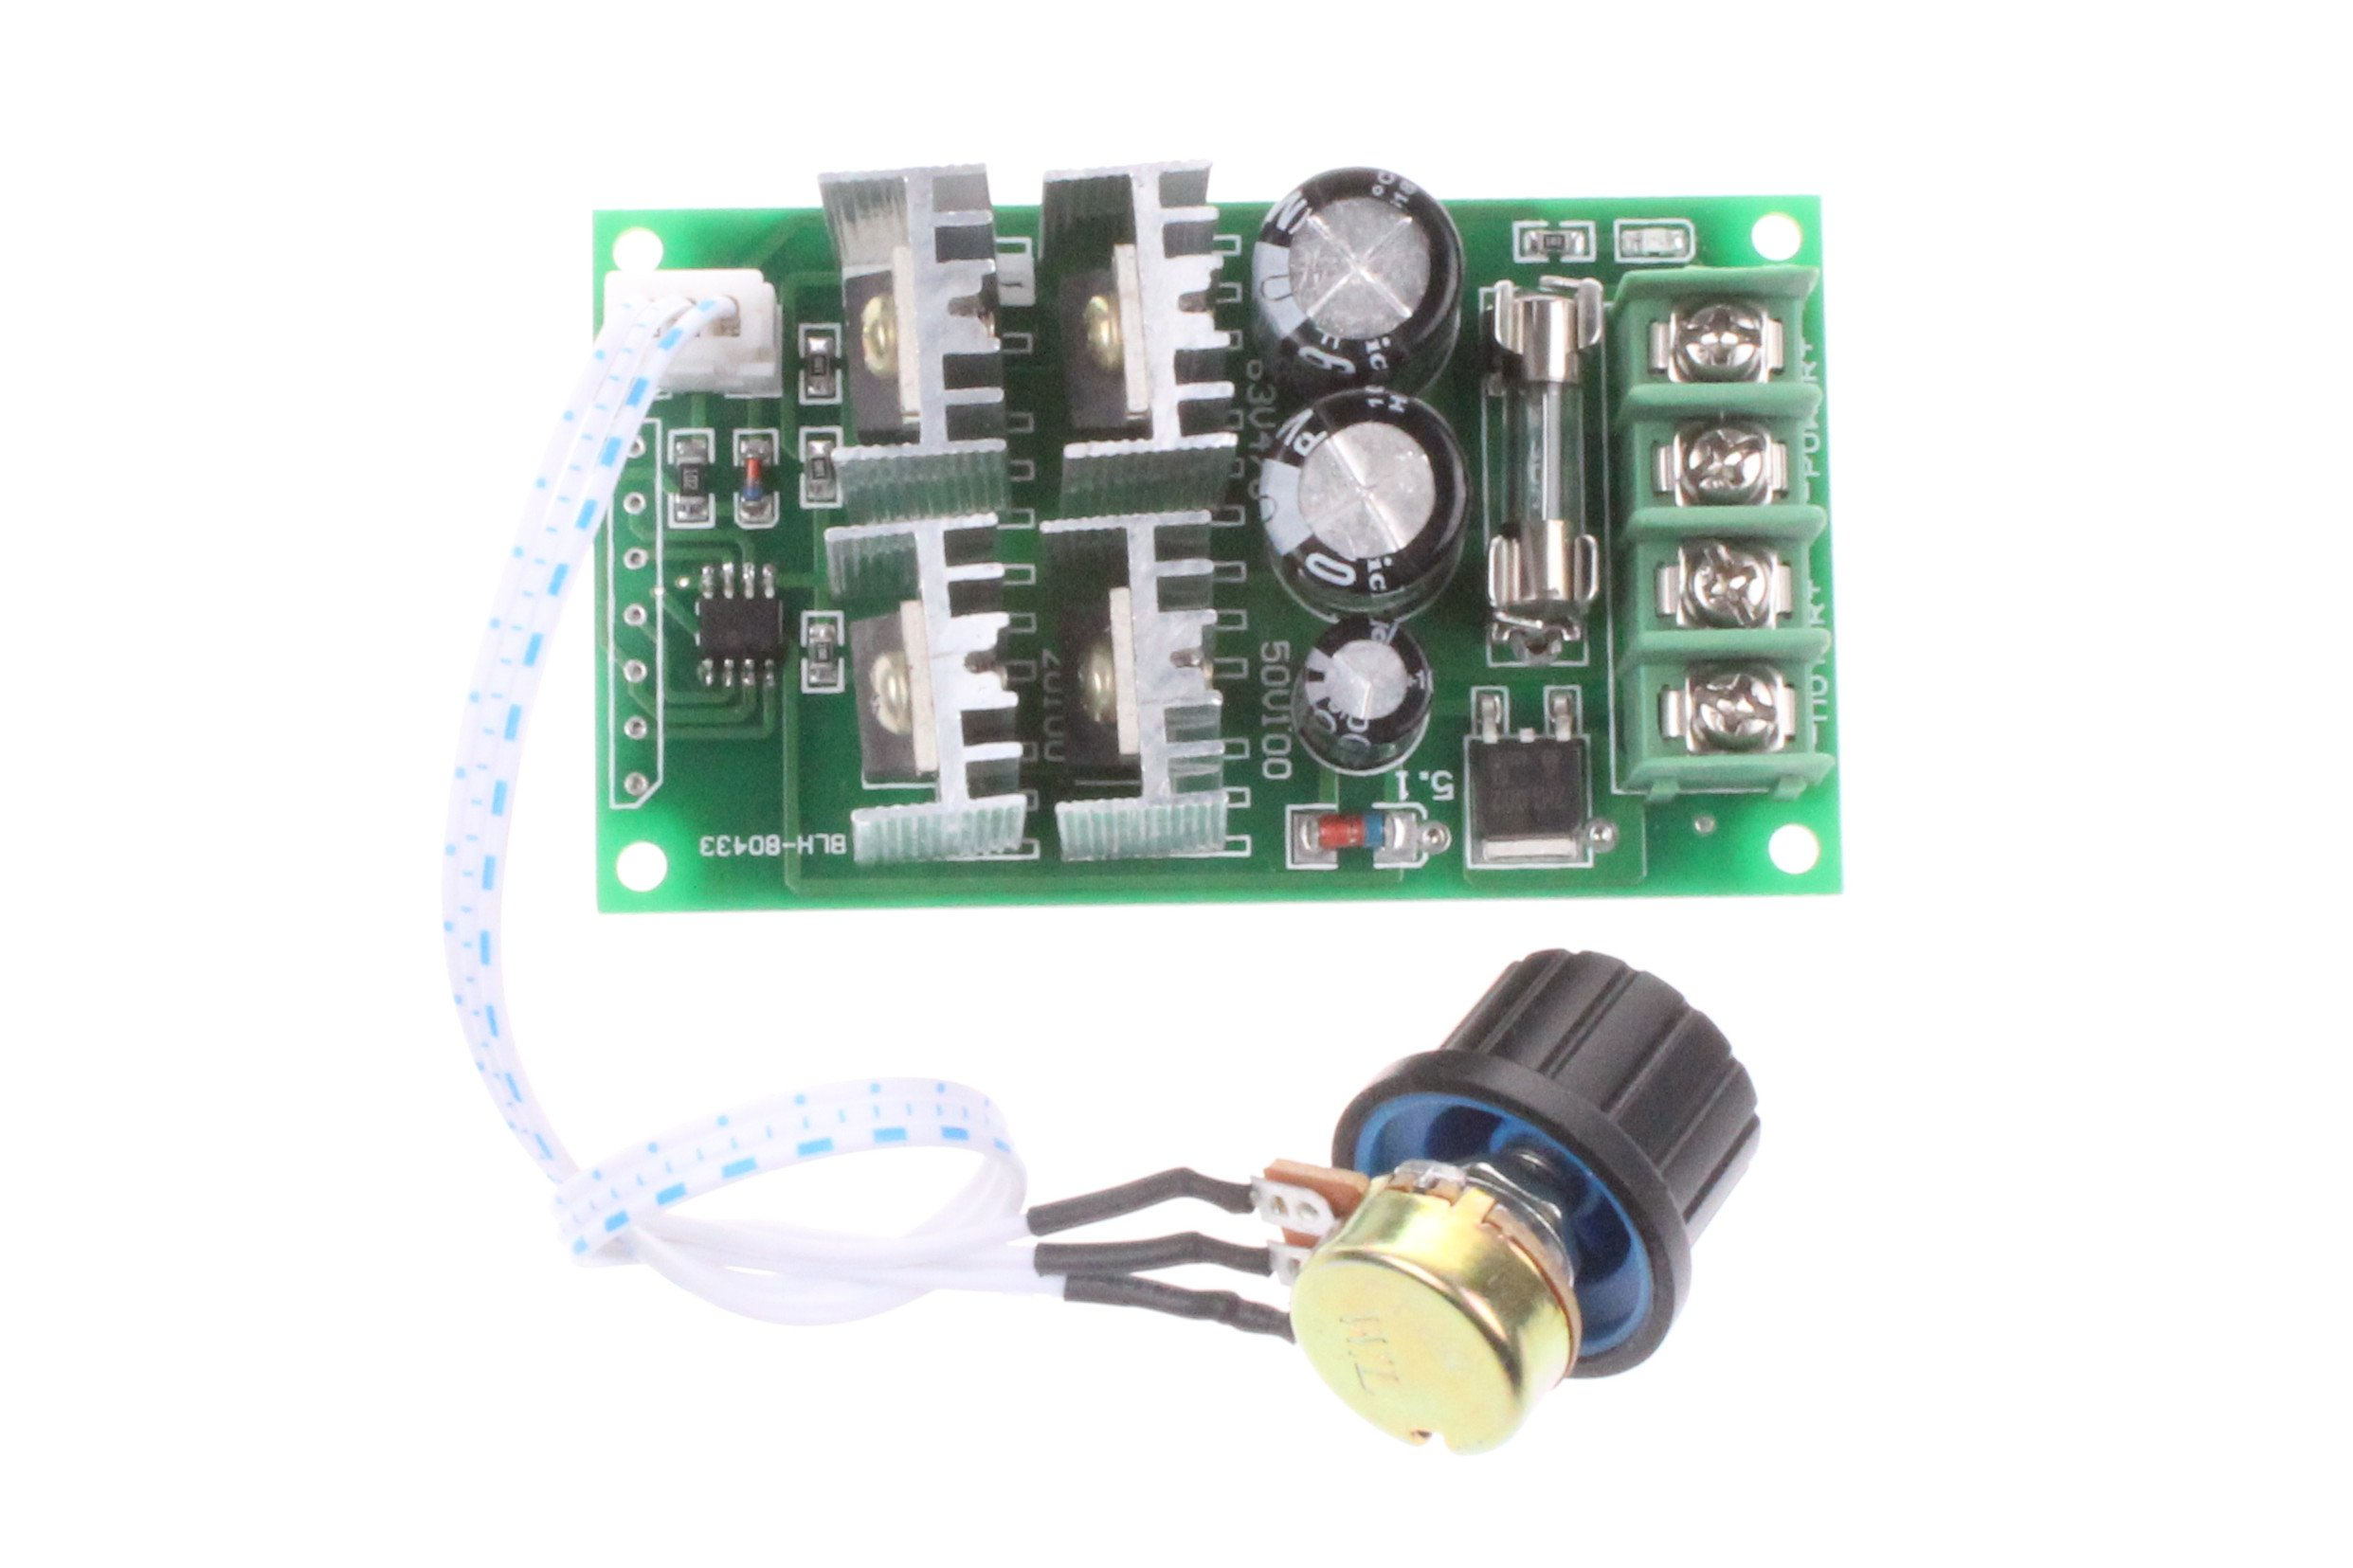 NOYITO 30A DC Motor Speed Controller DC 12V 24V 36V 48V 6-60V Brush Motor Controller Speed Range 0-100% Support PLC 0-5V MCU (30A) by NOYITO (Image #3)